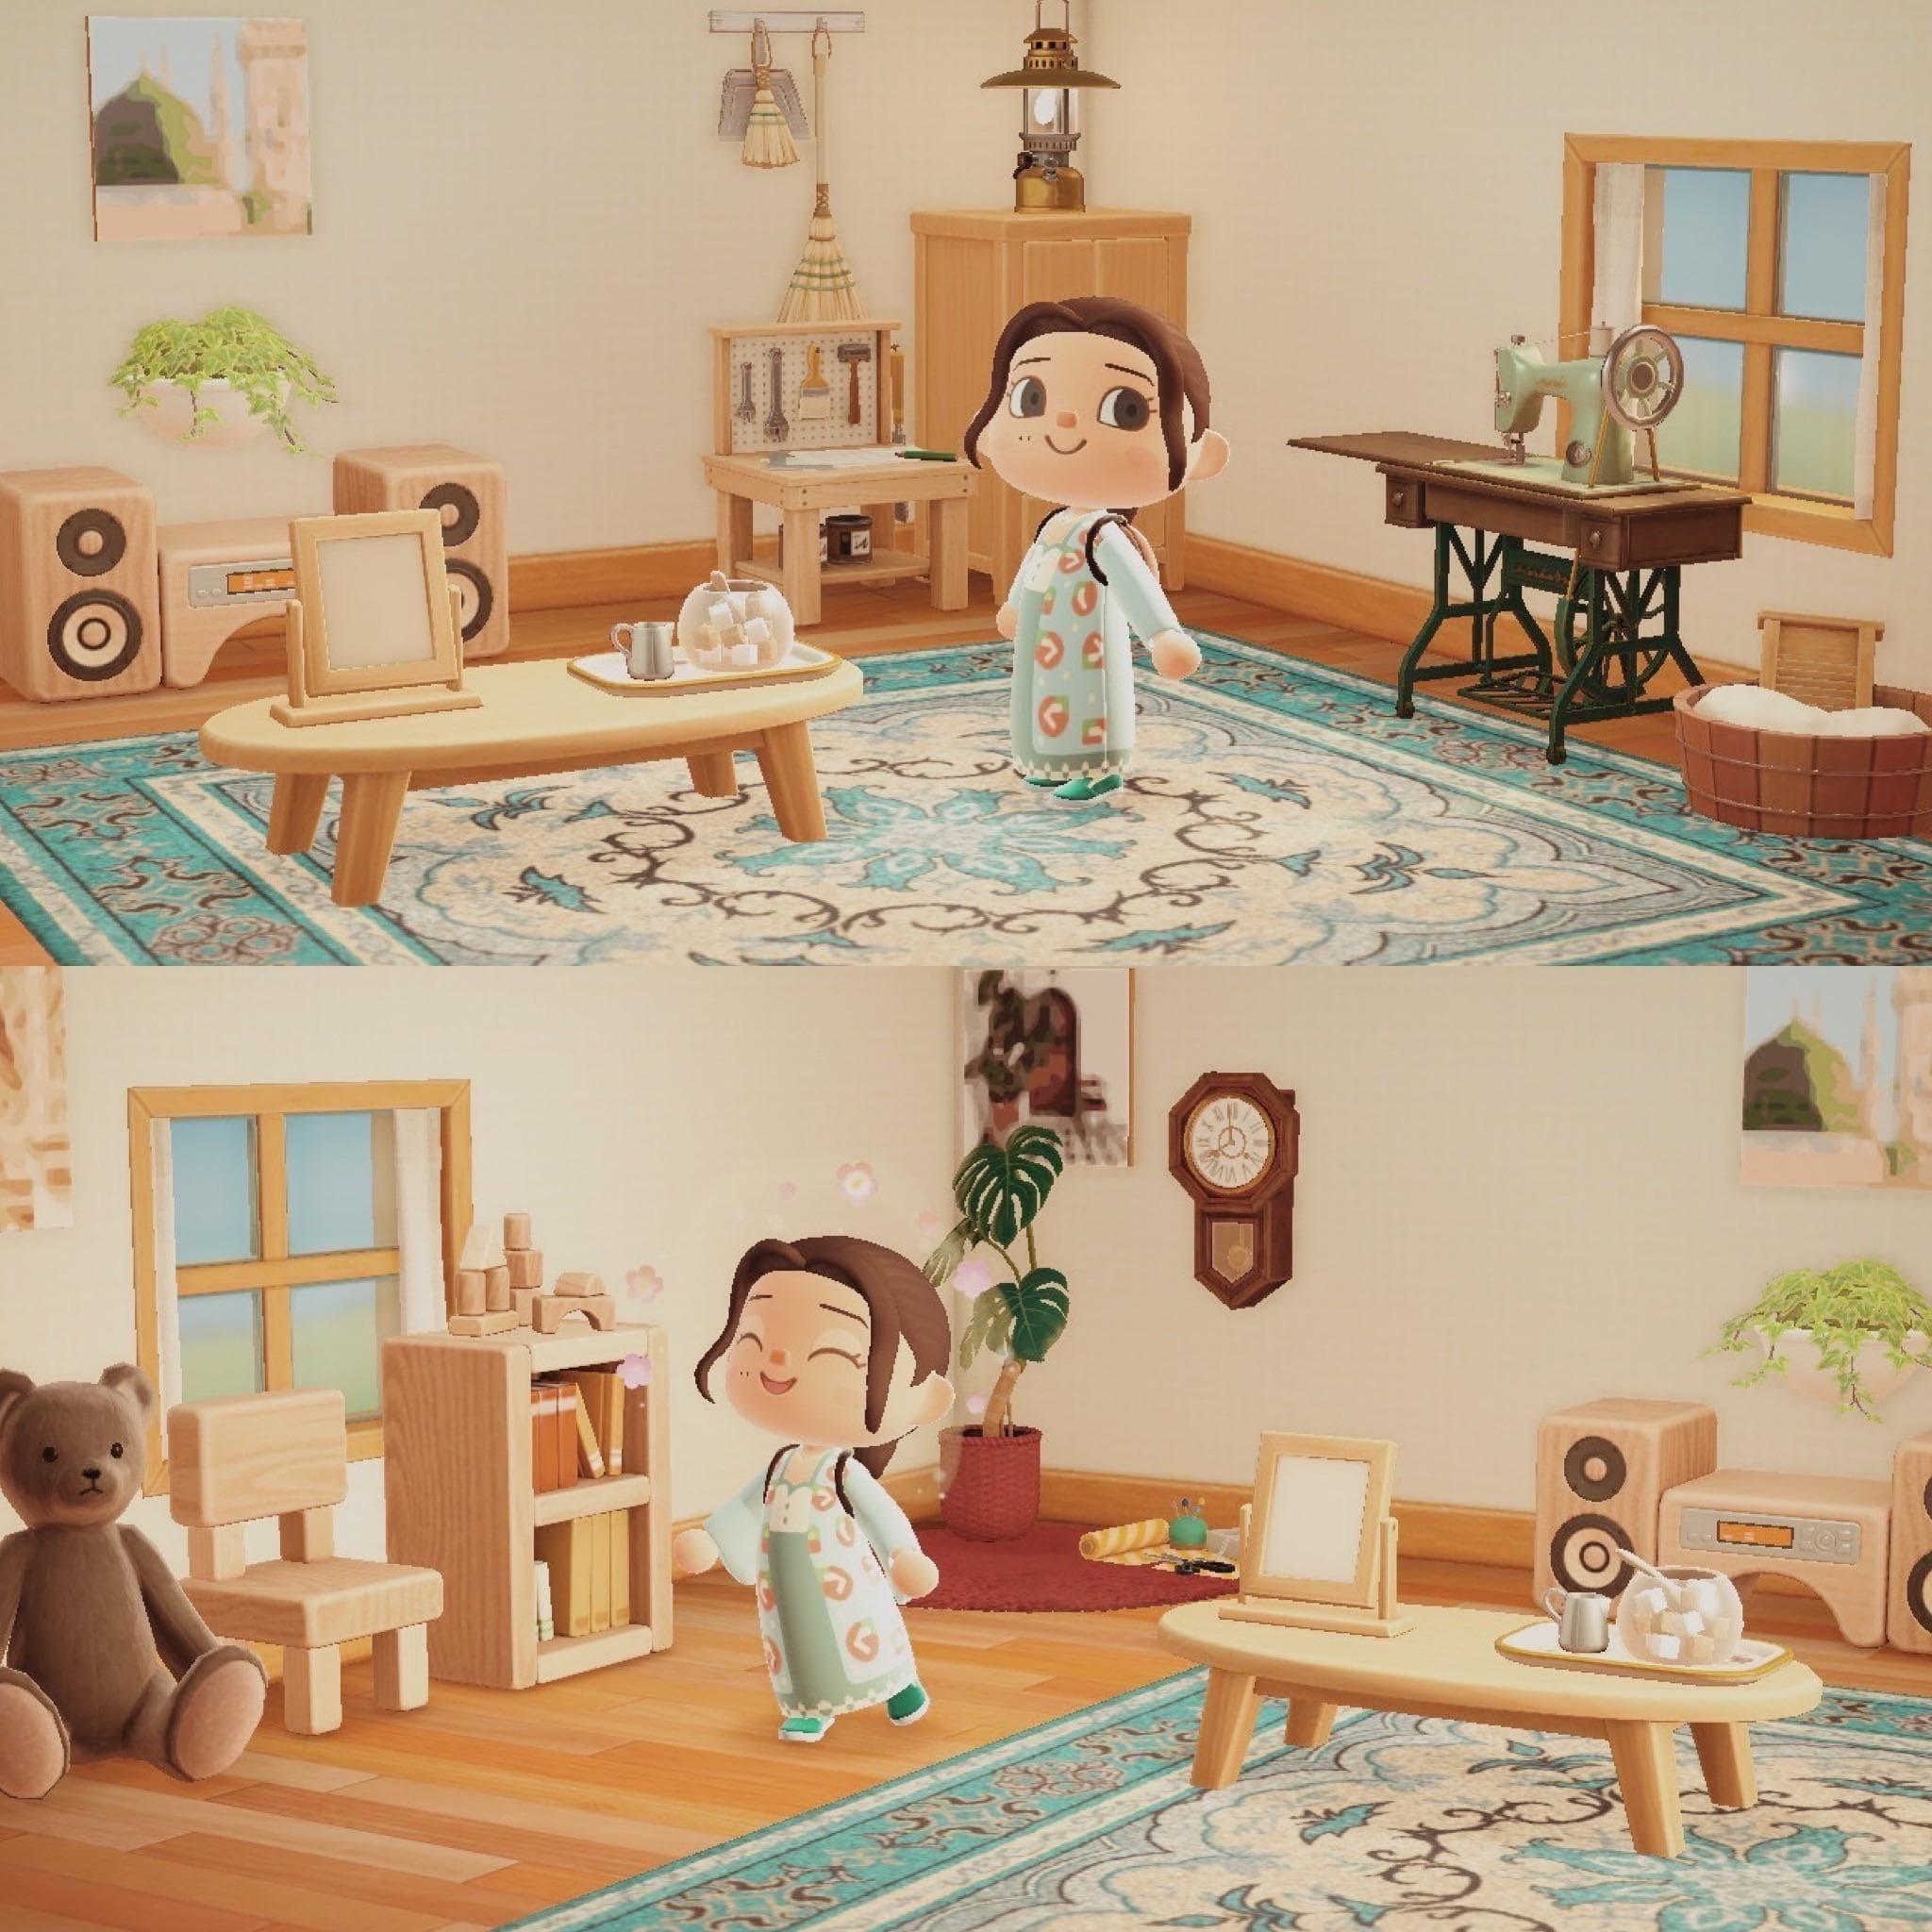 25 Creative Animal Crossing New Horizons House Designs